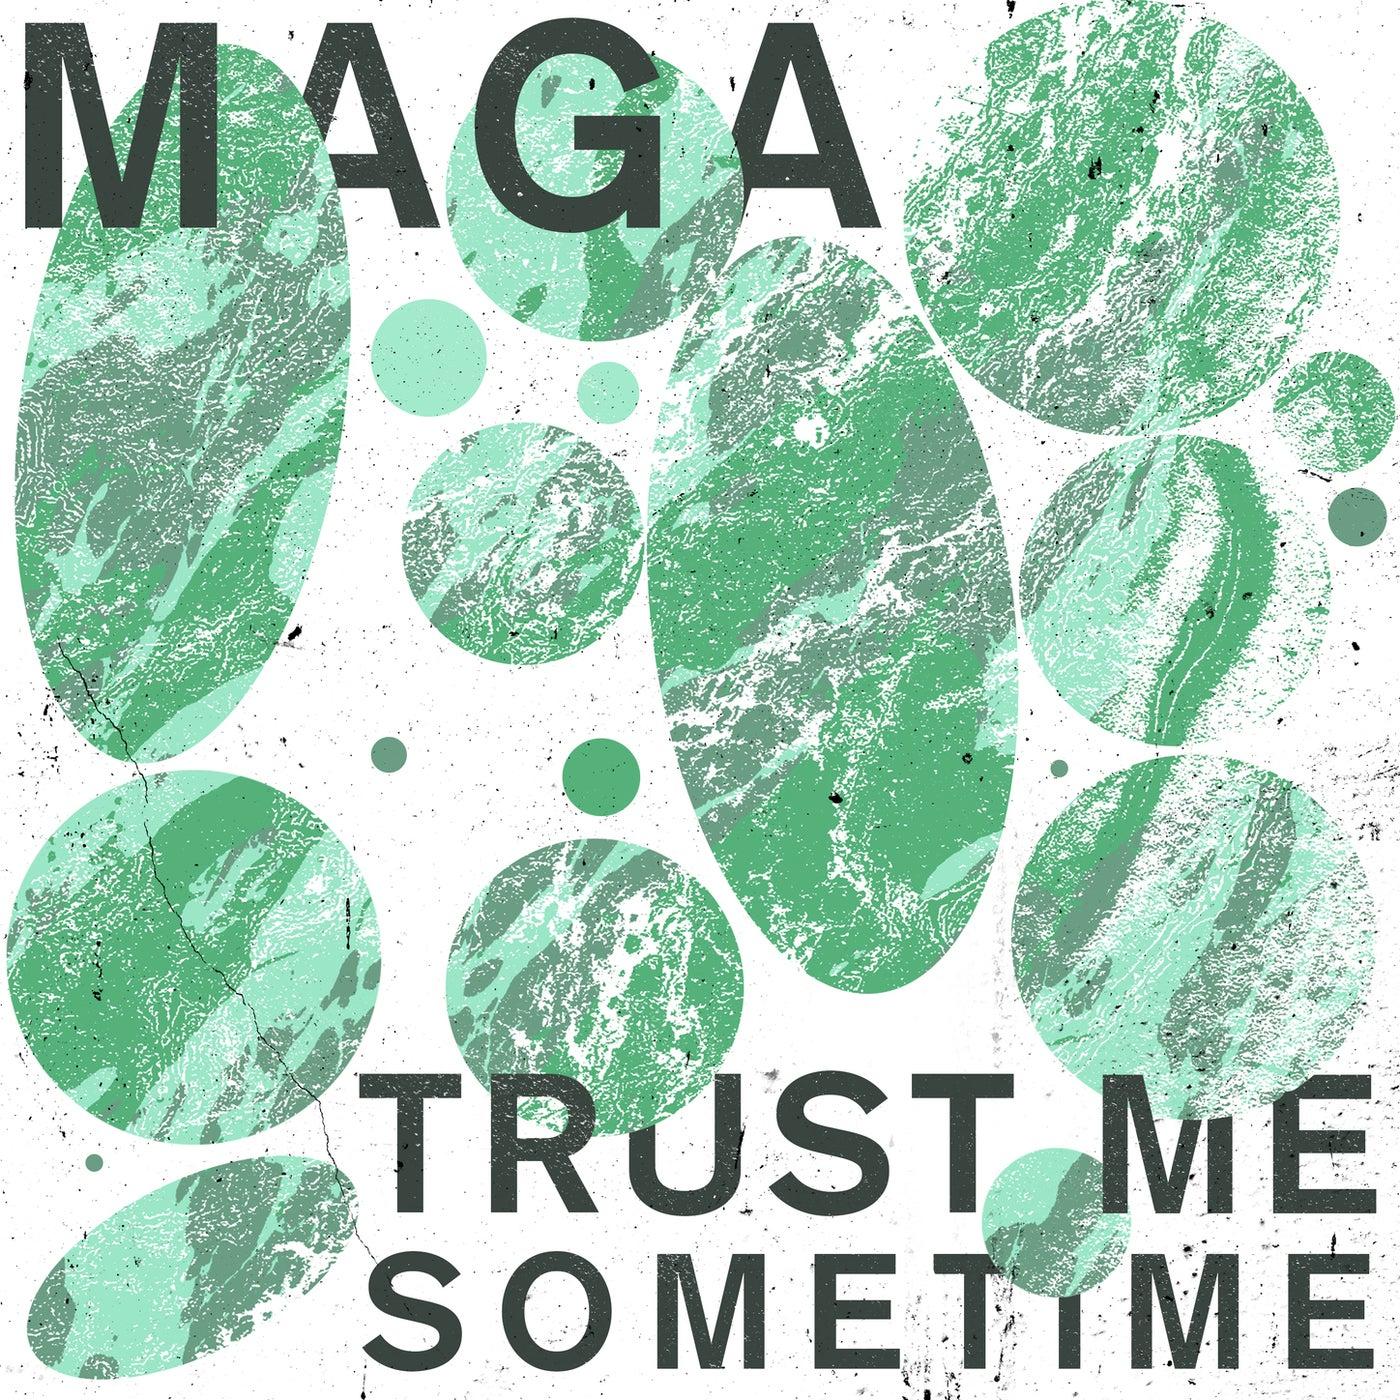 Trust Me Sometime (Nick Warren & Nicolas Rada Remix)